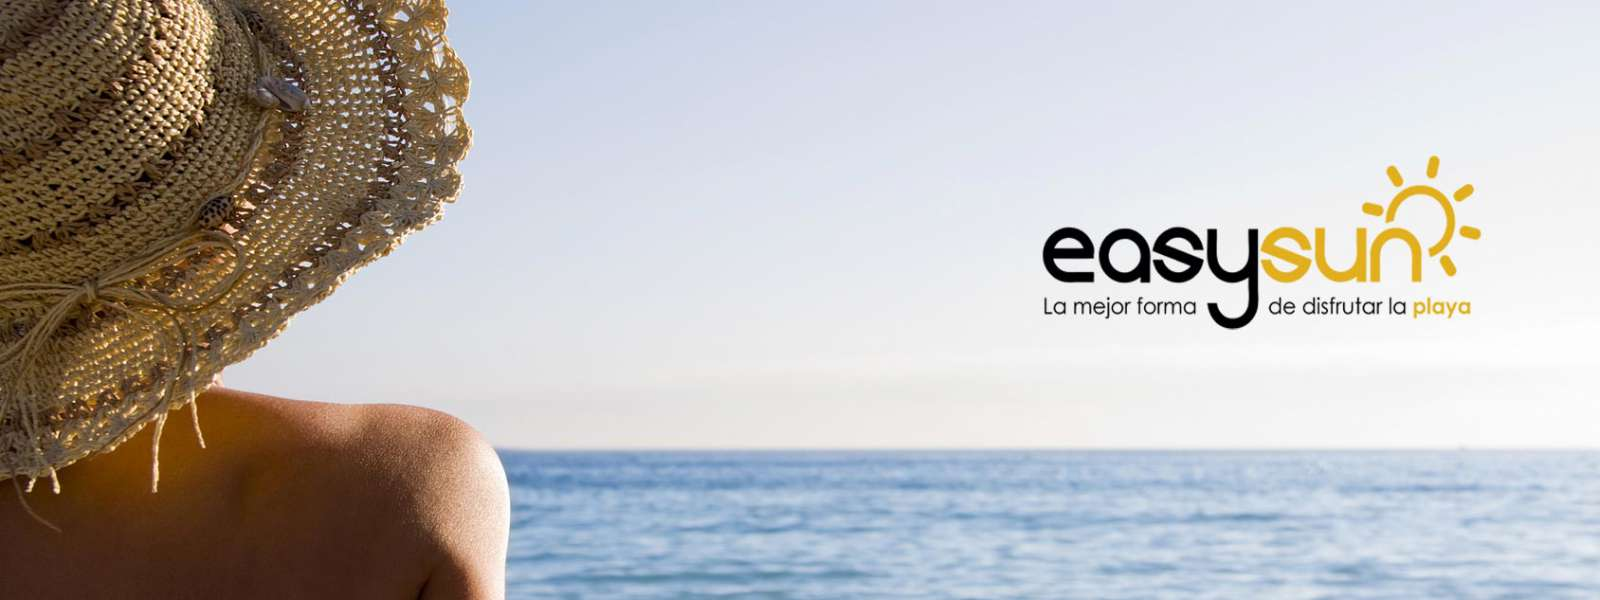 Hammock Easy Sun - Beach Club Estrella del Mar